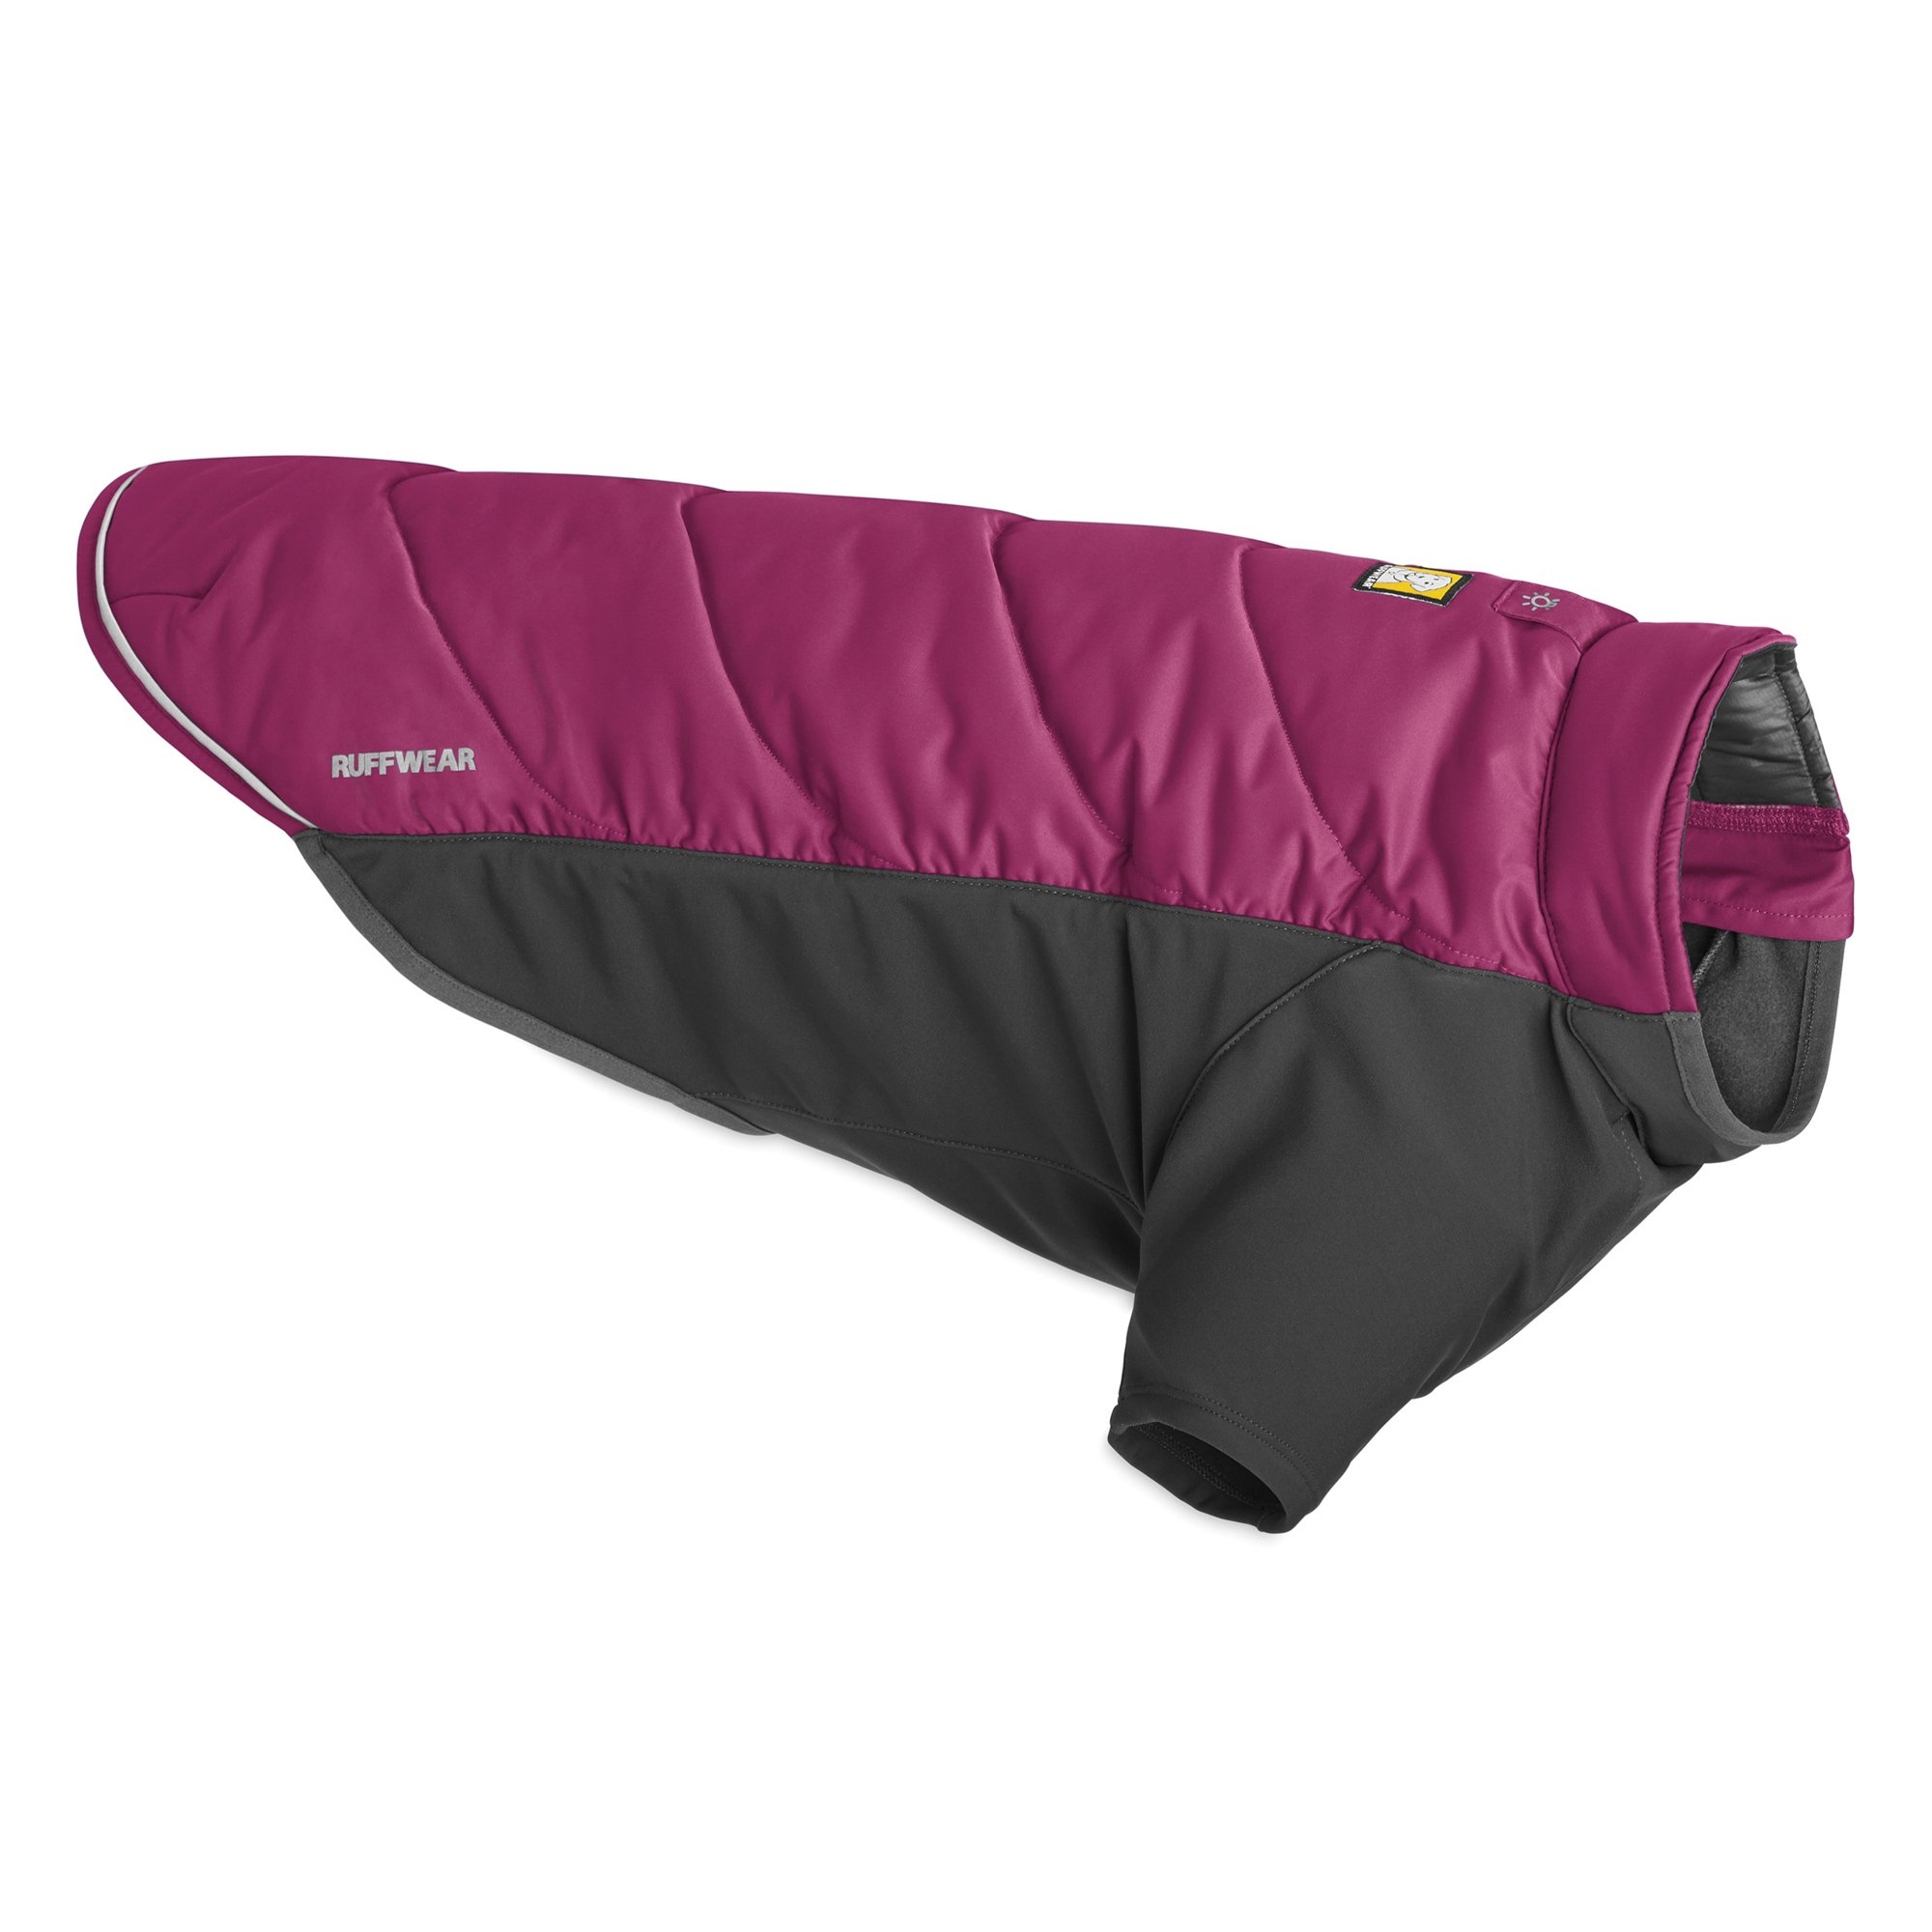 RUFFWEAR - Powder Hound Hybrid Insulation Jacket for Dogs, Larkspur Purple, Large